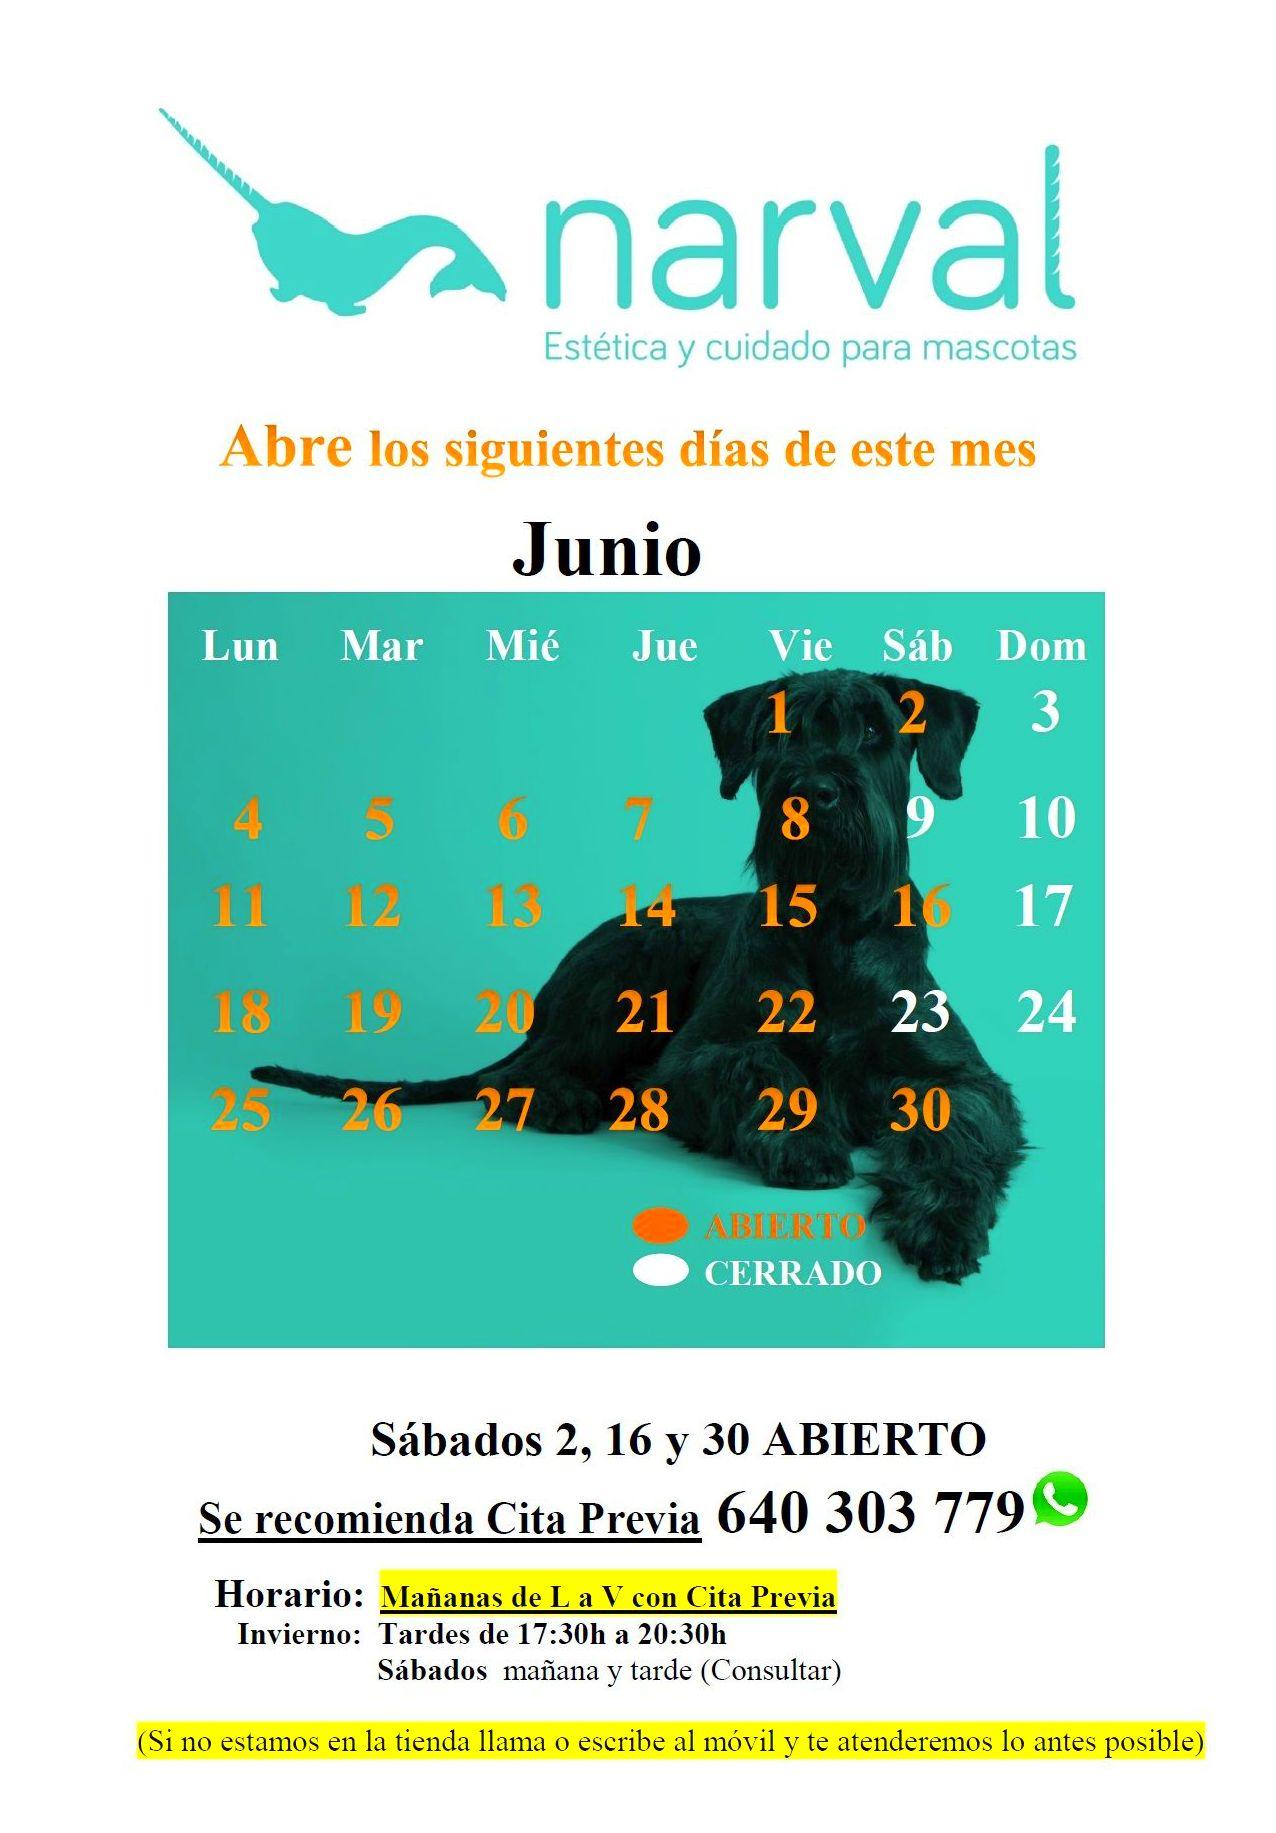 Narval Mascotas peluquería canina Leganés   JUNIO 18